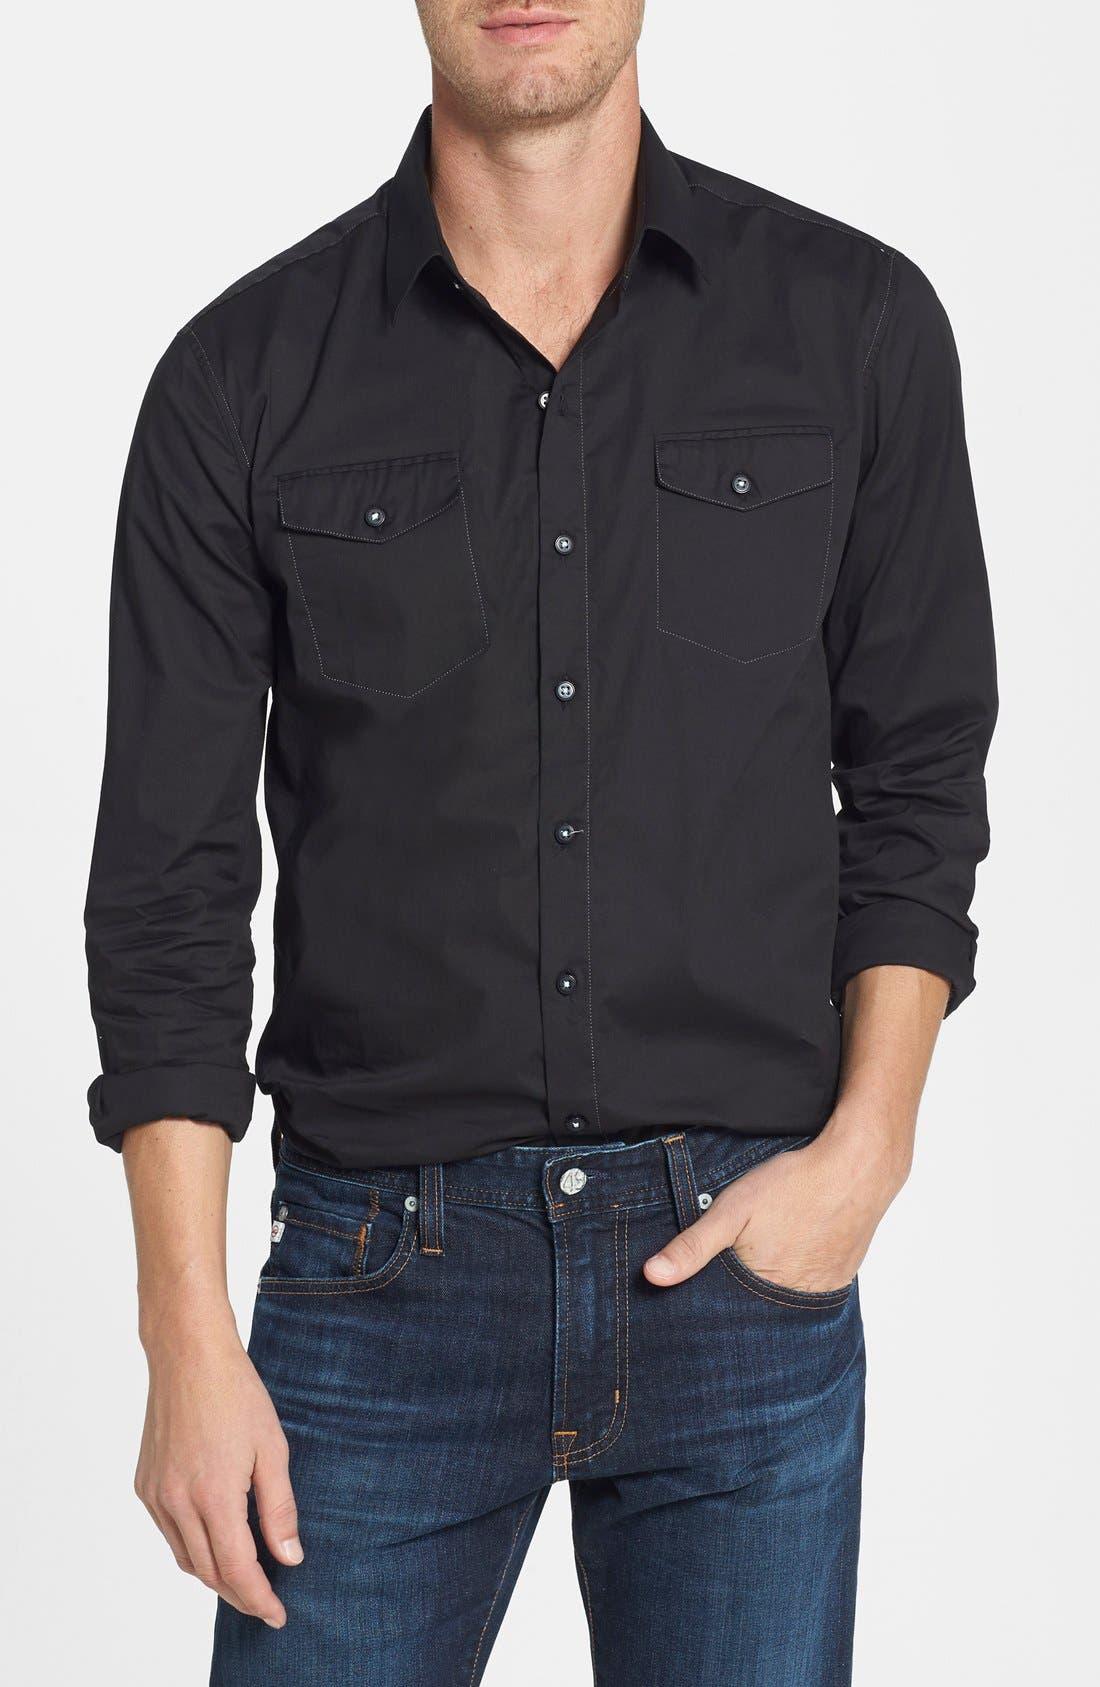 Alternate Image 1 Selected - 7 Diamonds 'All American' Trim Fit Cotton Blend Sport Shirt